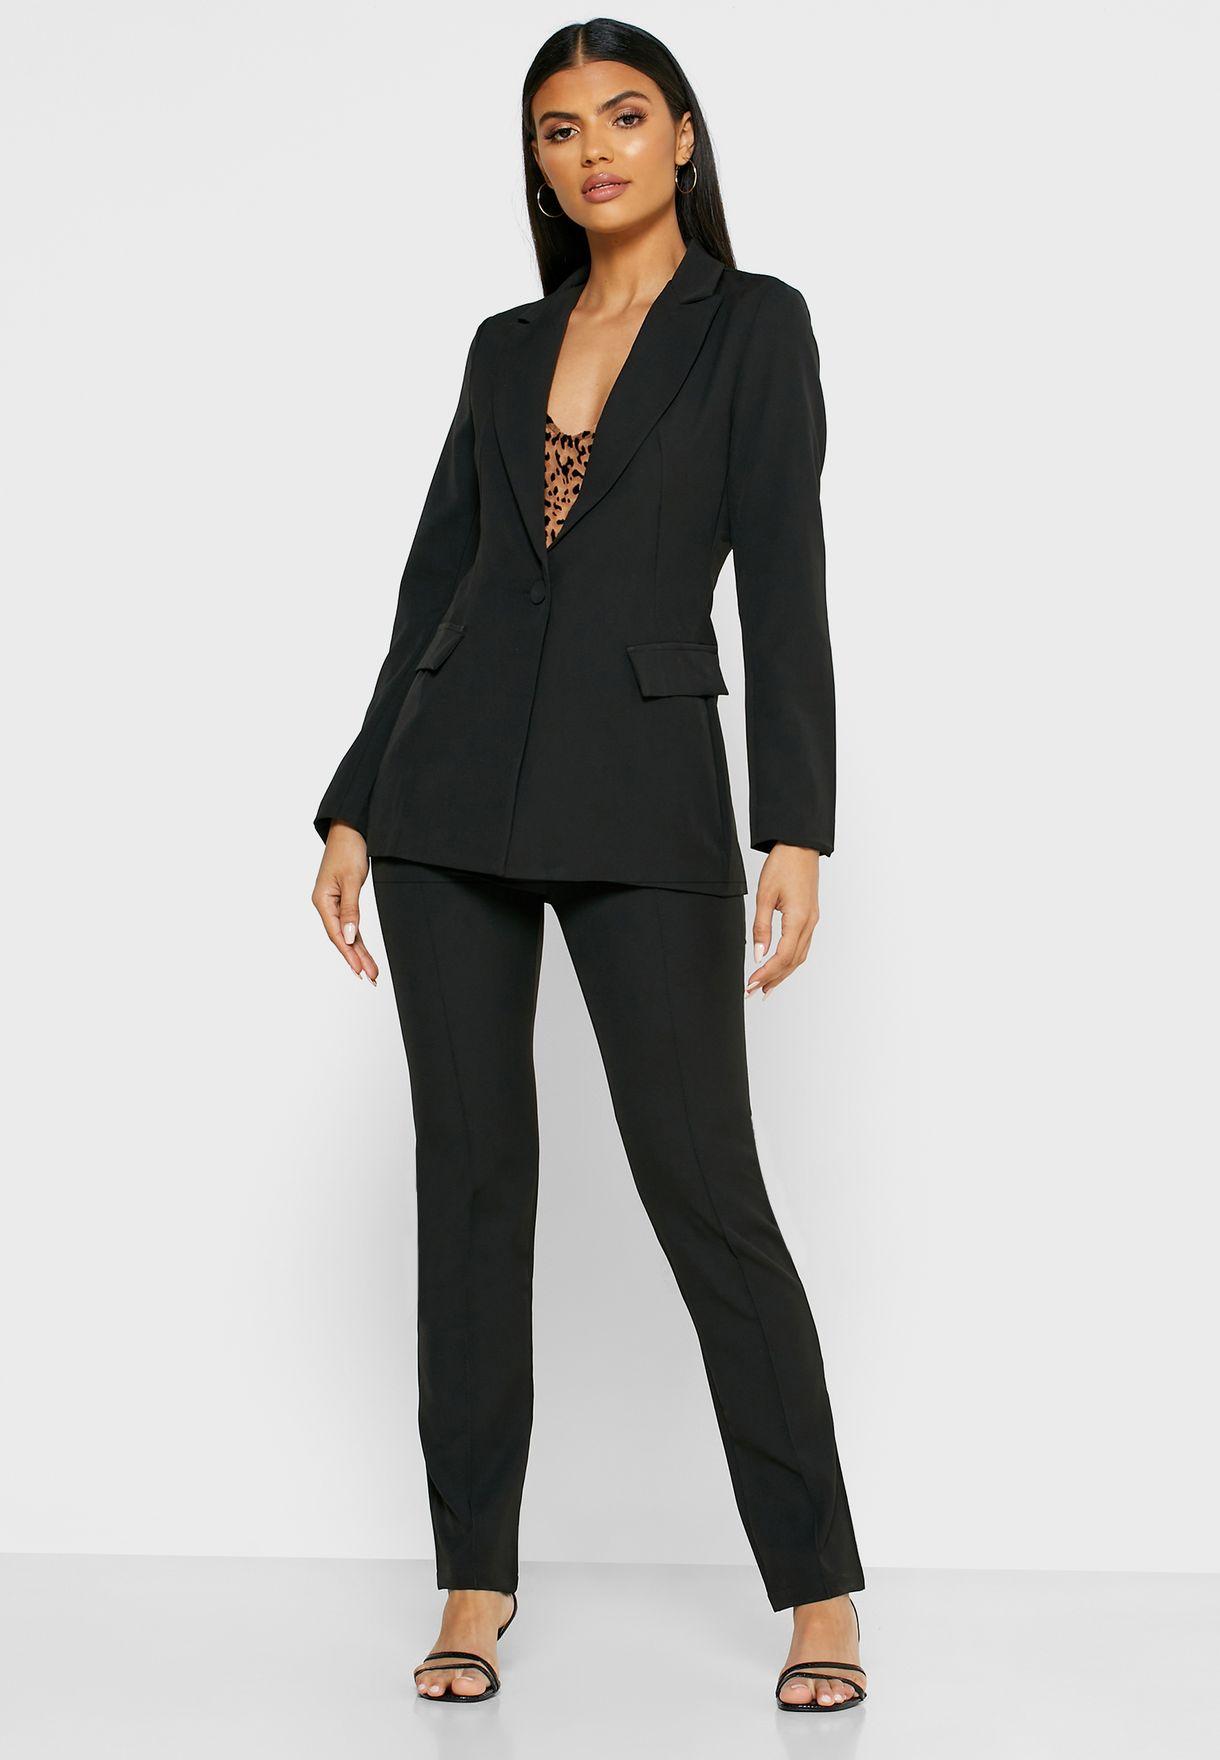 2 In 1 Blazer Pants Set